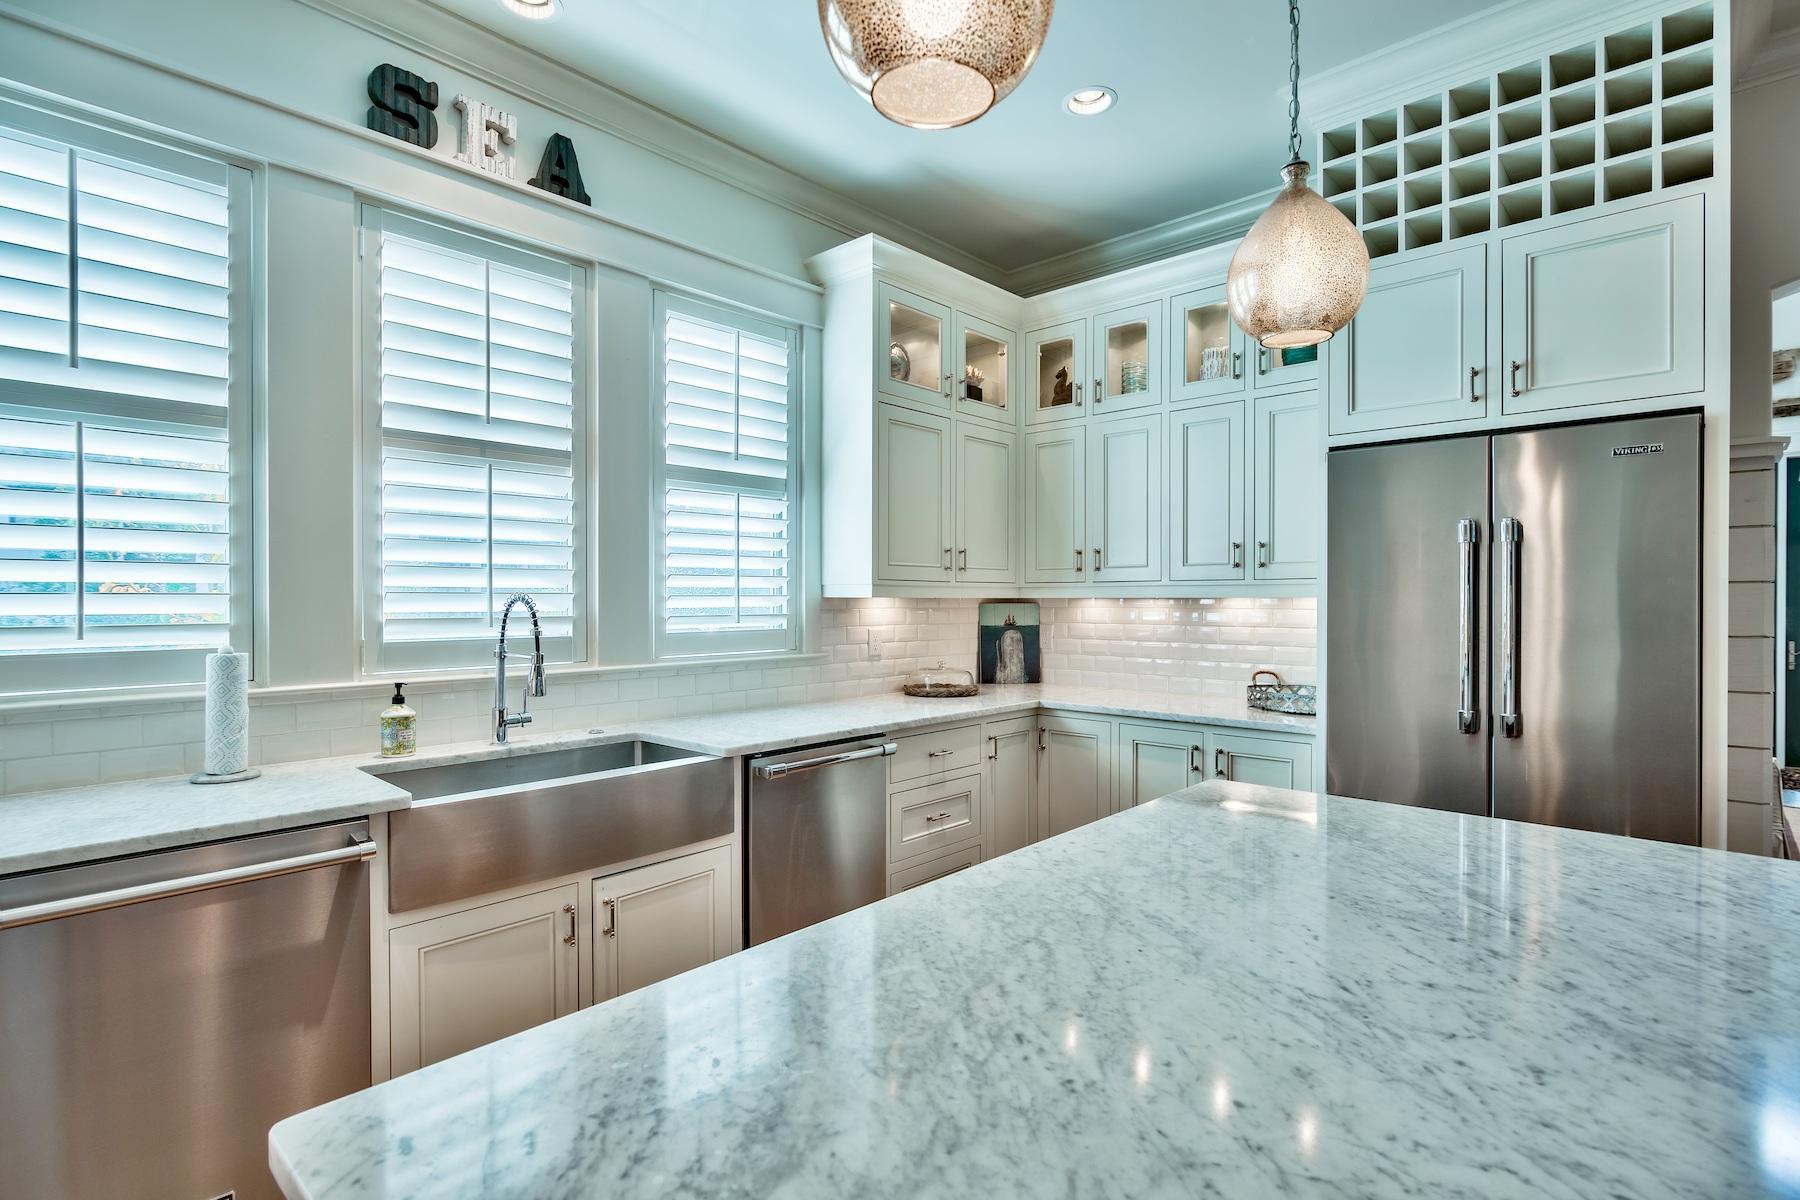 11 Salt Box,Inlet Beach,Florida 32461,4 Bedrooms Bedrooms,4 BathroomsBathrooms,Detached single family,Salt Box,20131126143817002353000000